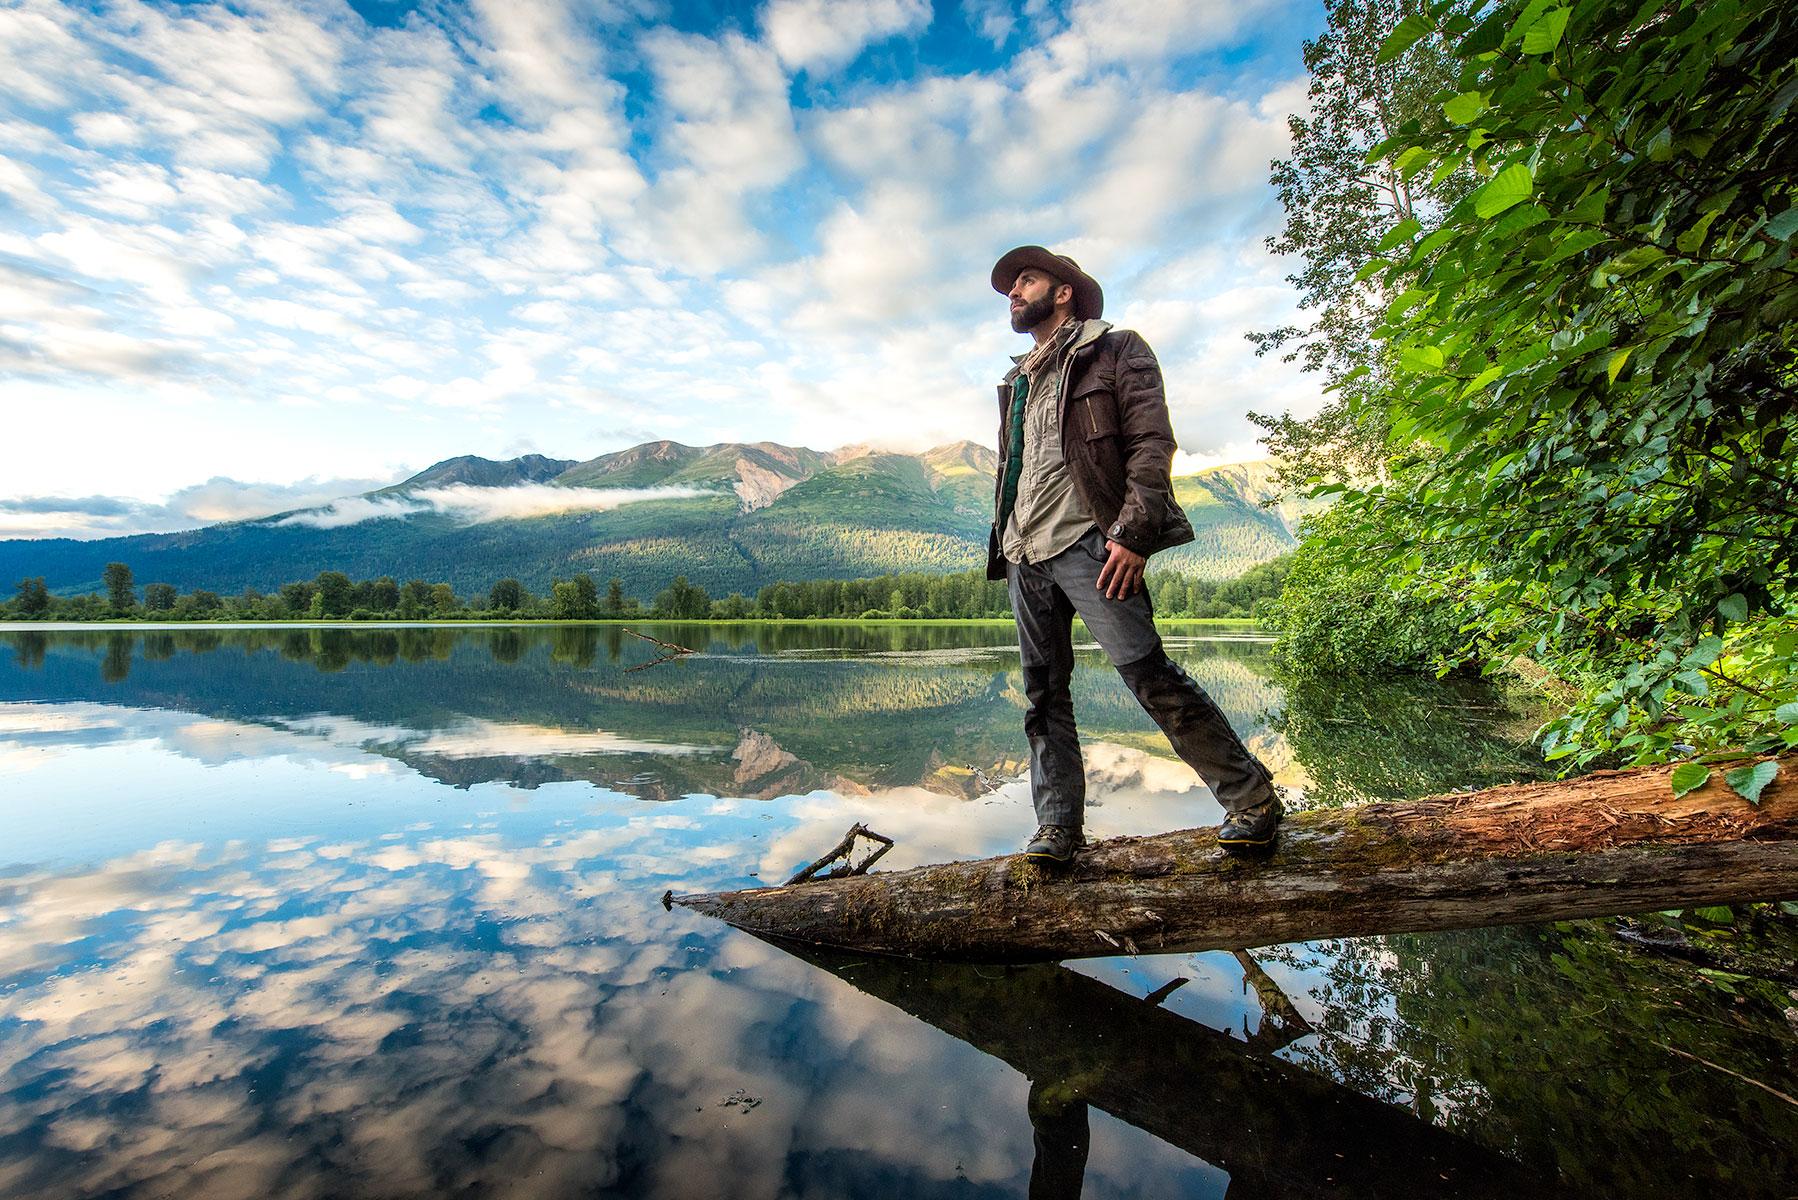 austin-trigg-brave-wilderness-alaska-Coyote-Mosquito-Lake-Standing-Log-Sunset.jpg